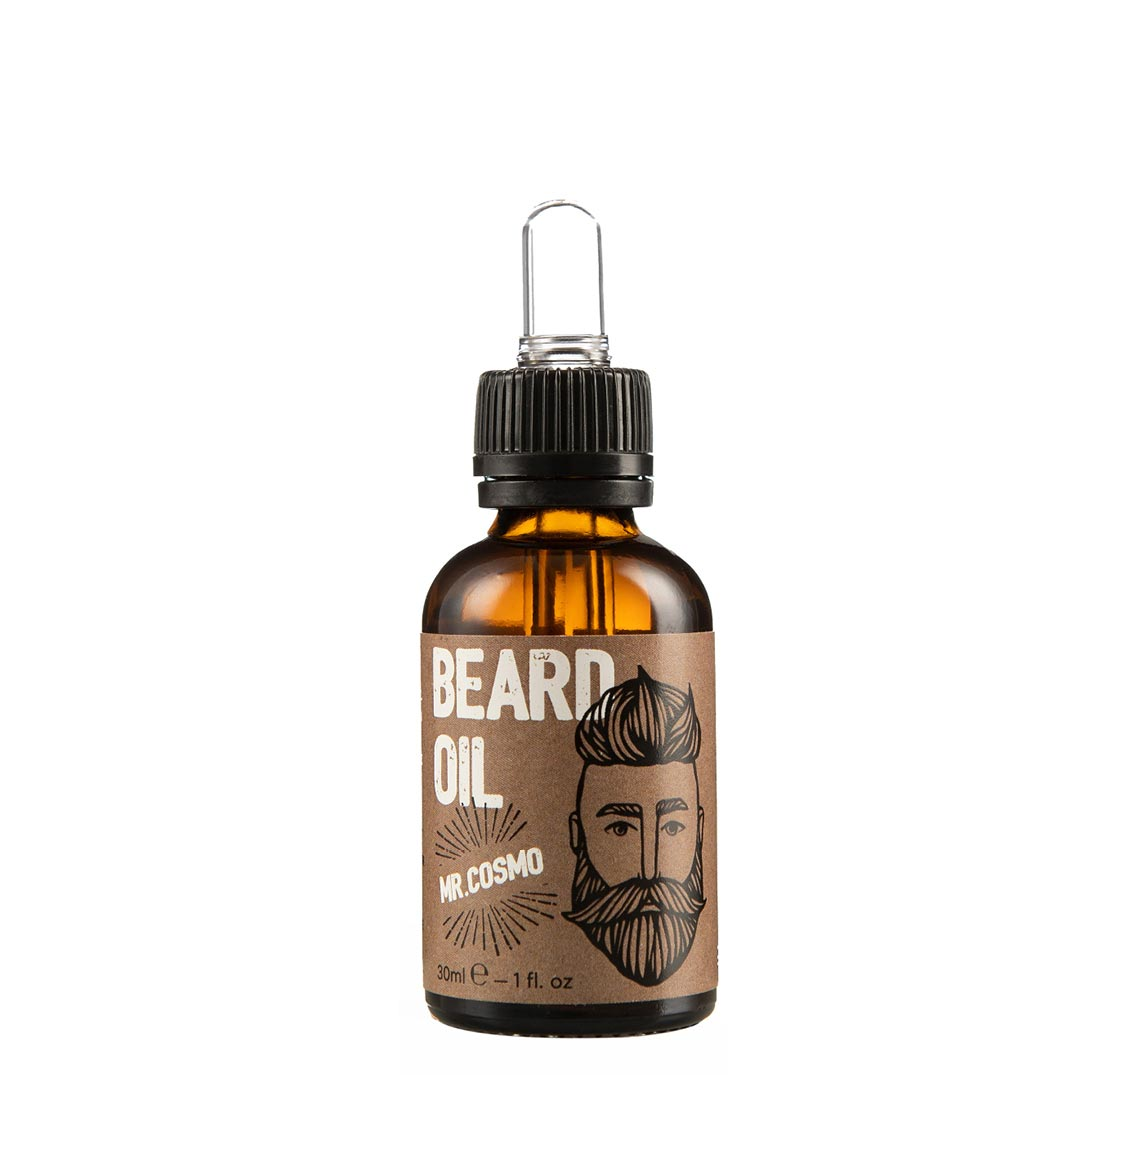 Cosmogent Λάδι Γενειάδας Mr. Cosmo Beard Oil 30ml